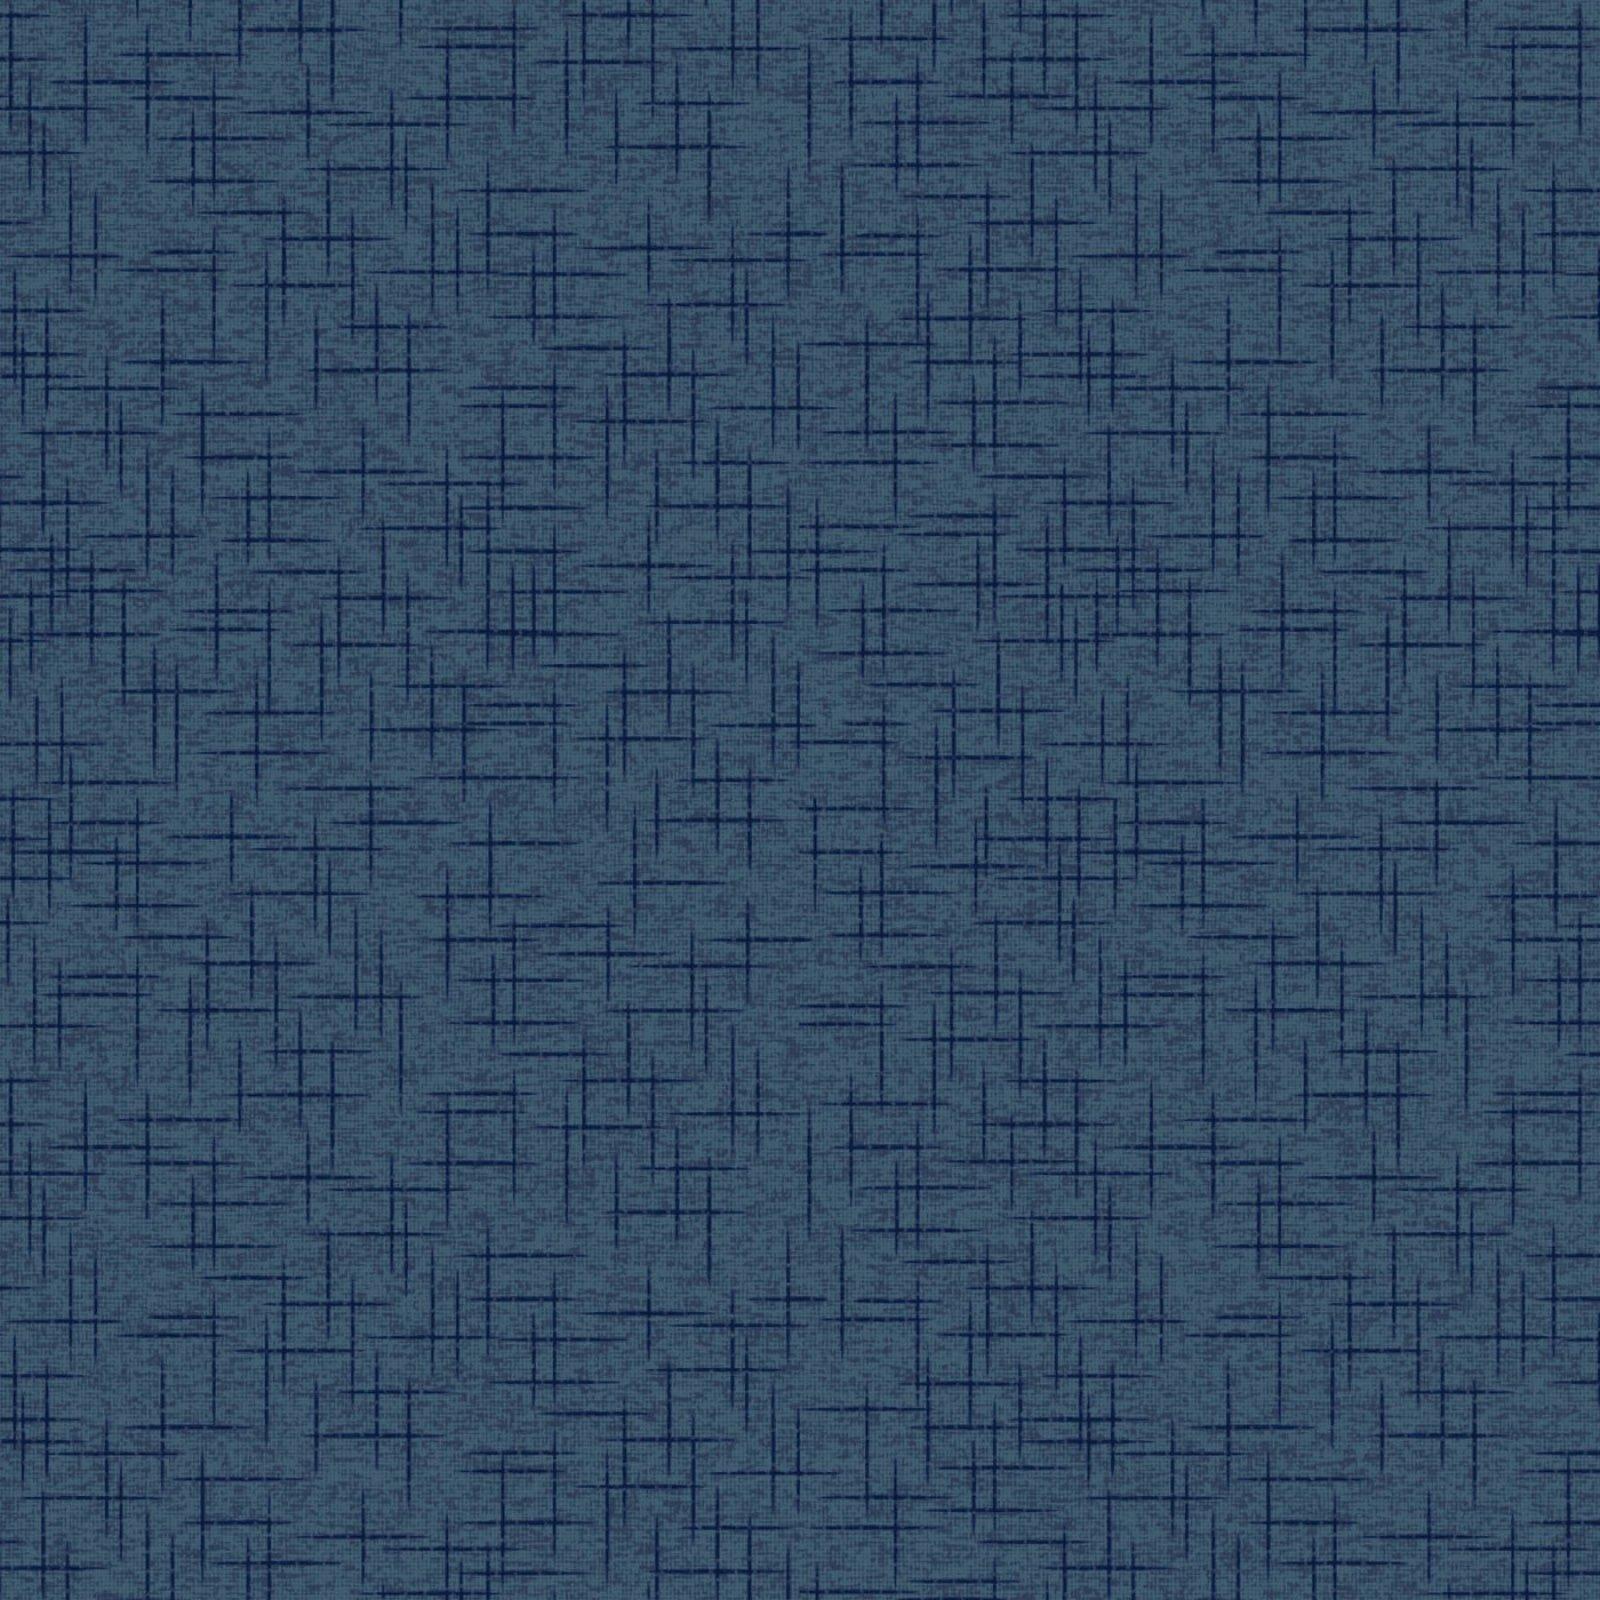 Kimberbell Basics Linen Texture Deep Navy MAS9399-N